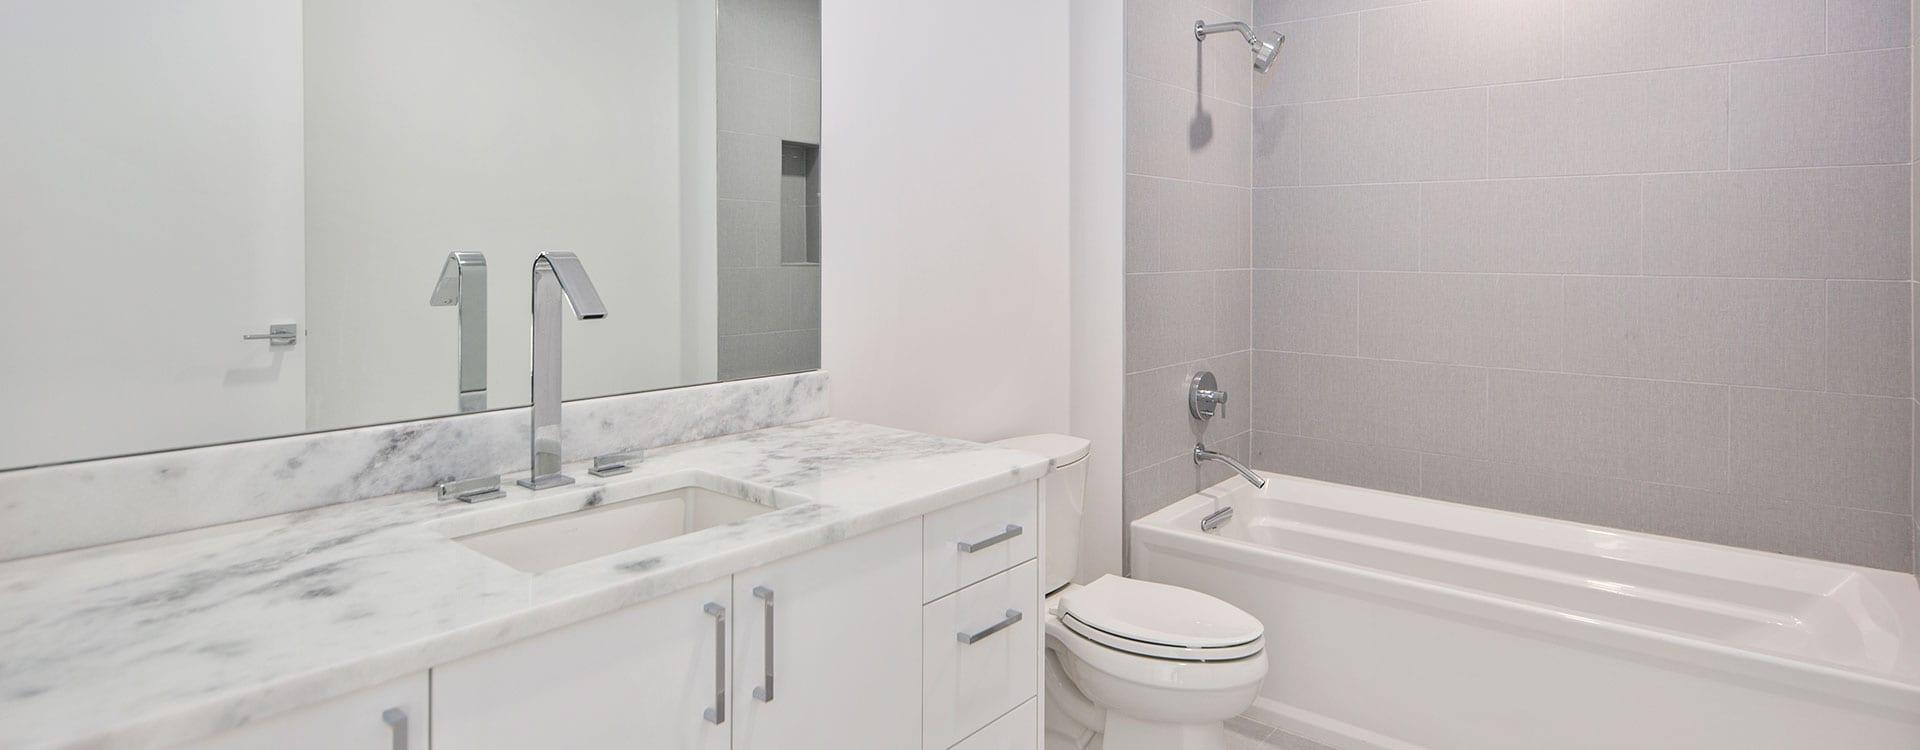 BLVD Residence 903 Bedroom bathroom